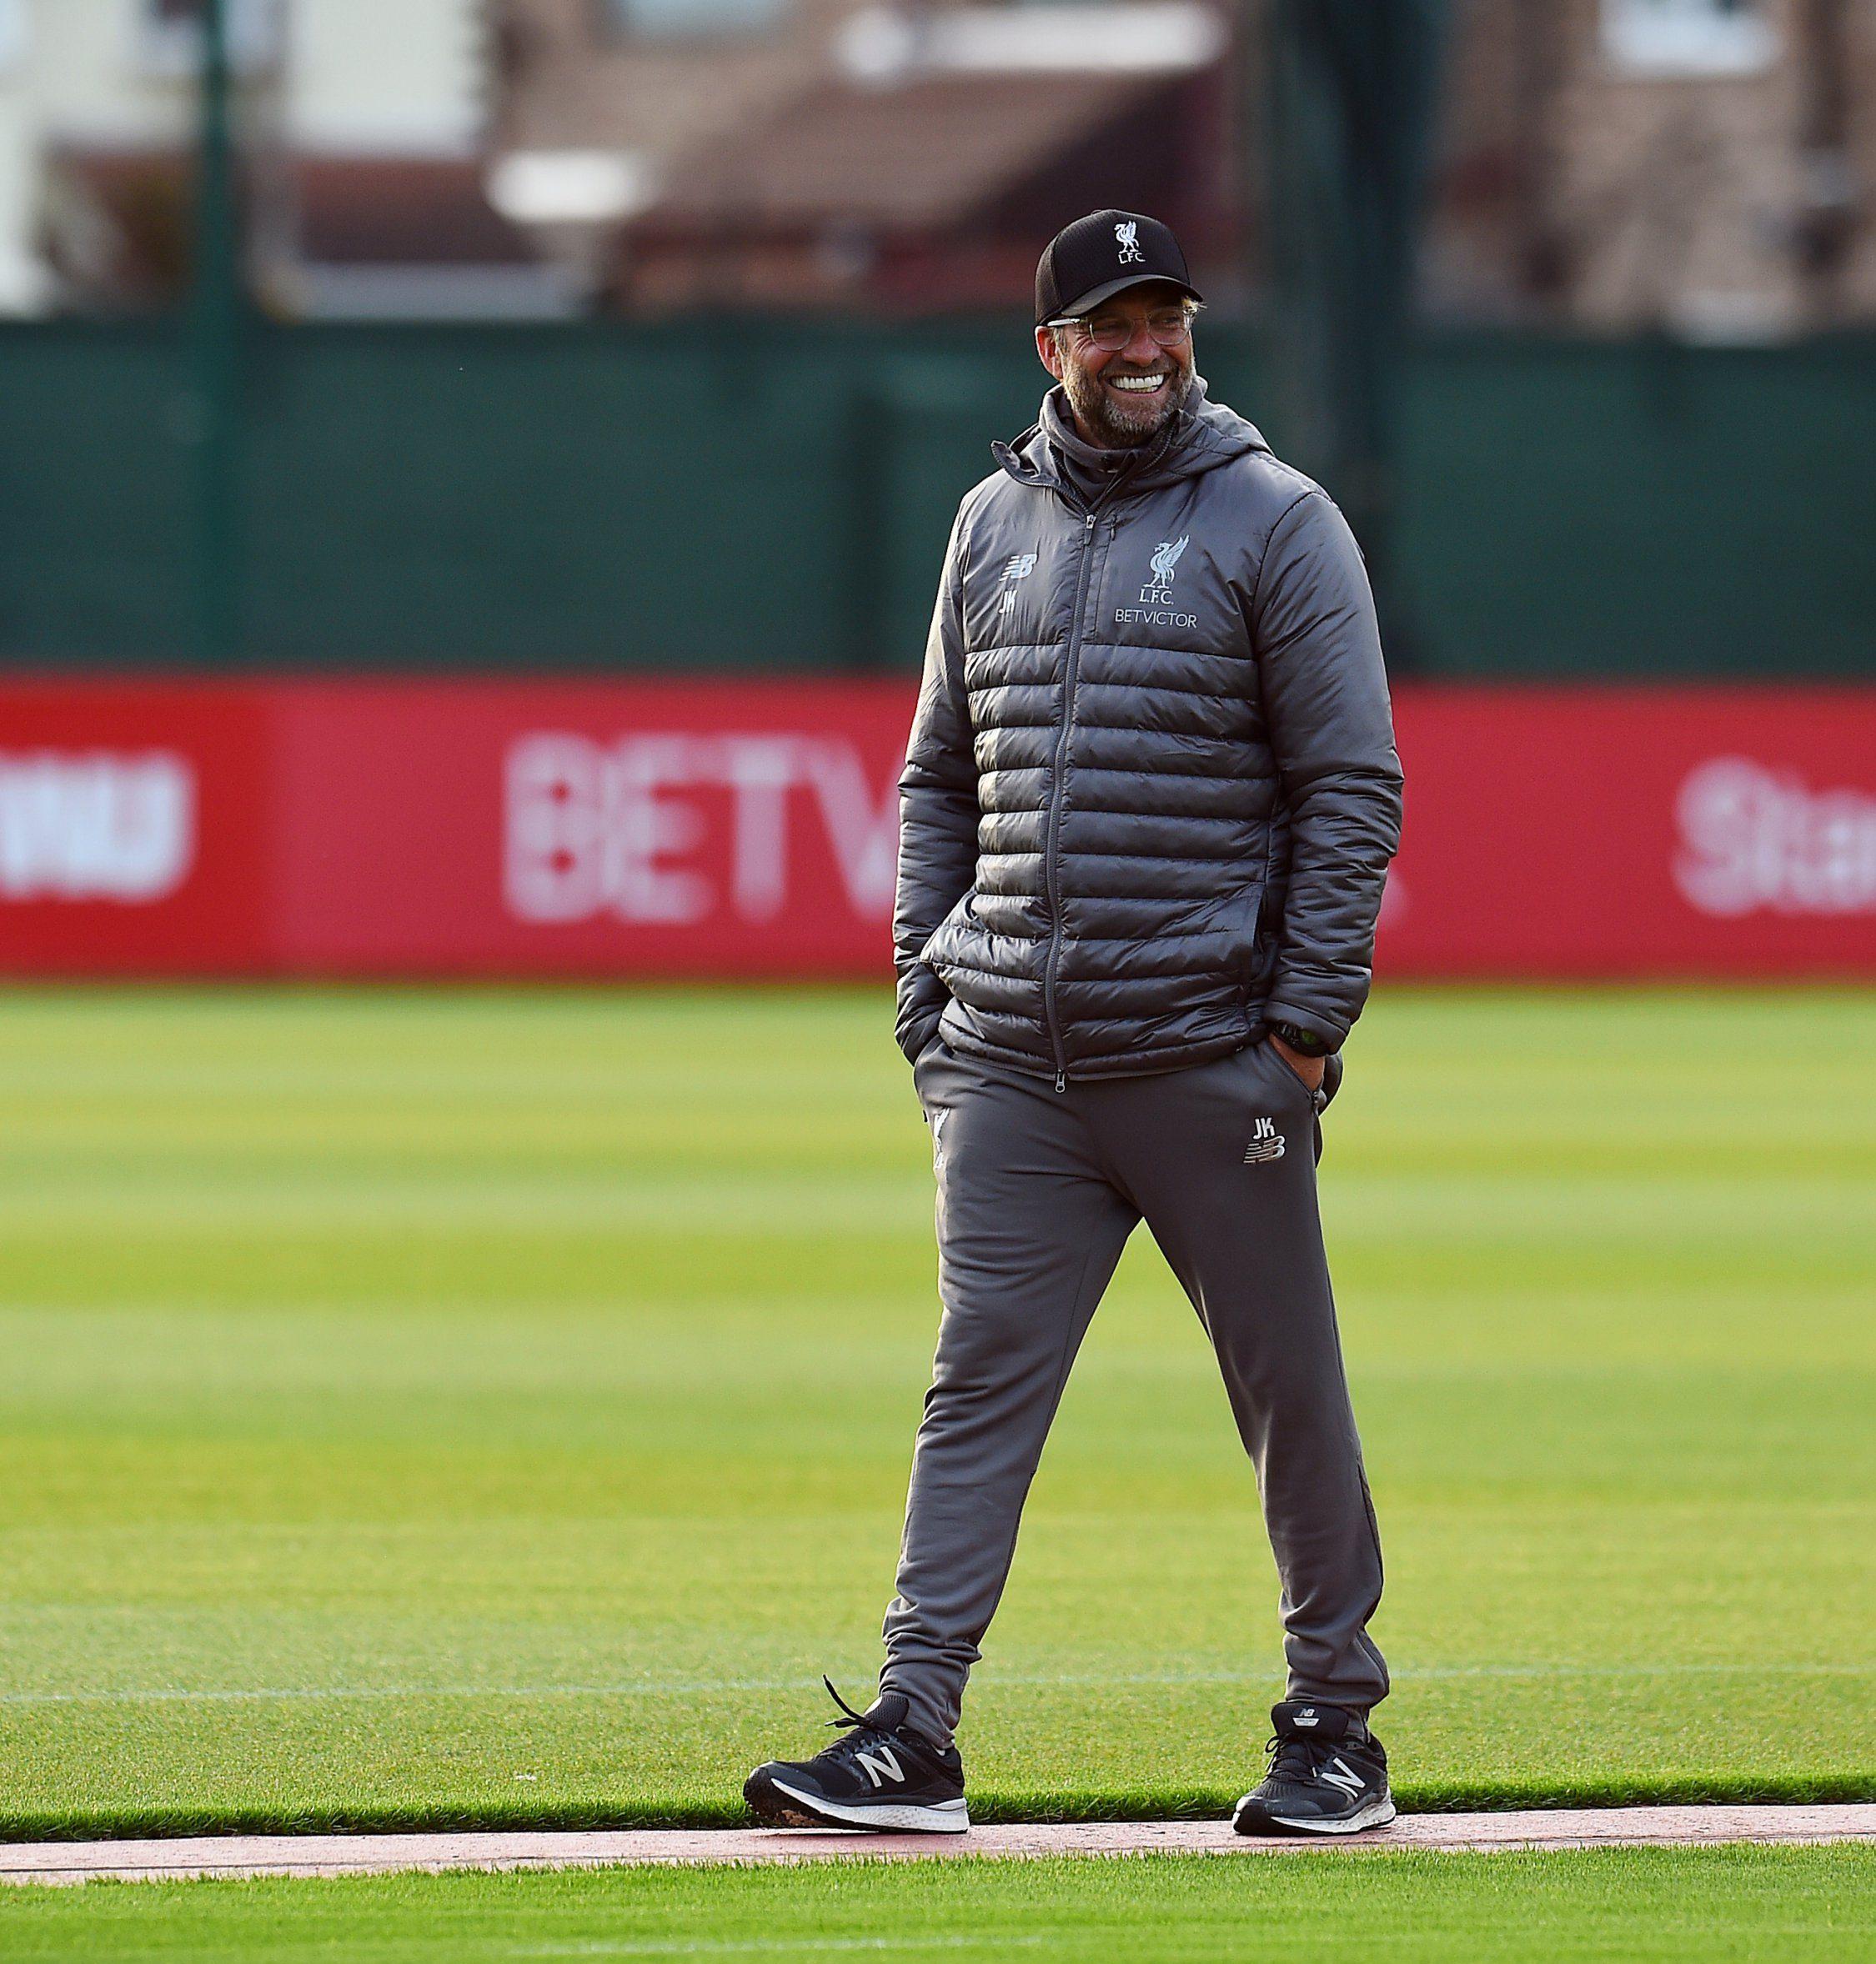 David Wagner suspects Jurgen Klopp will exaggerate Liverpool's injury concerns